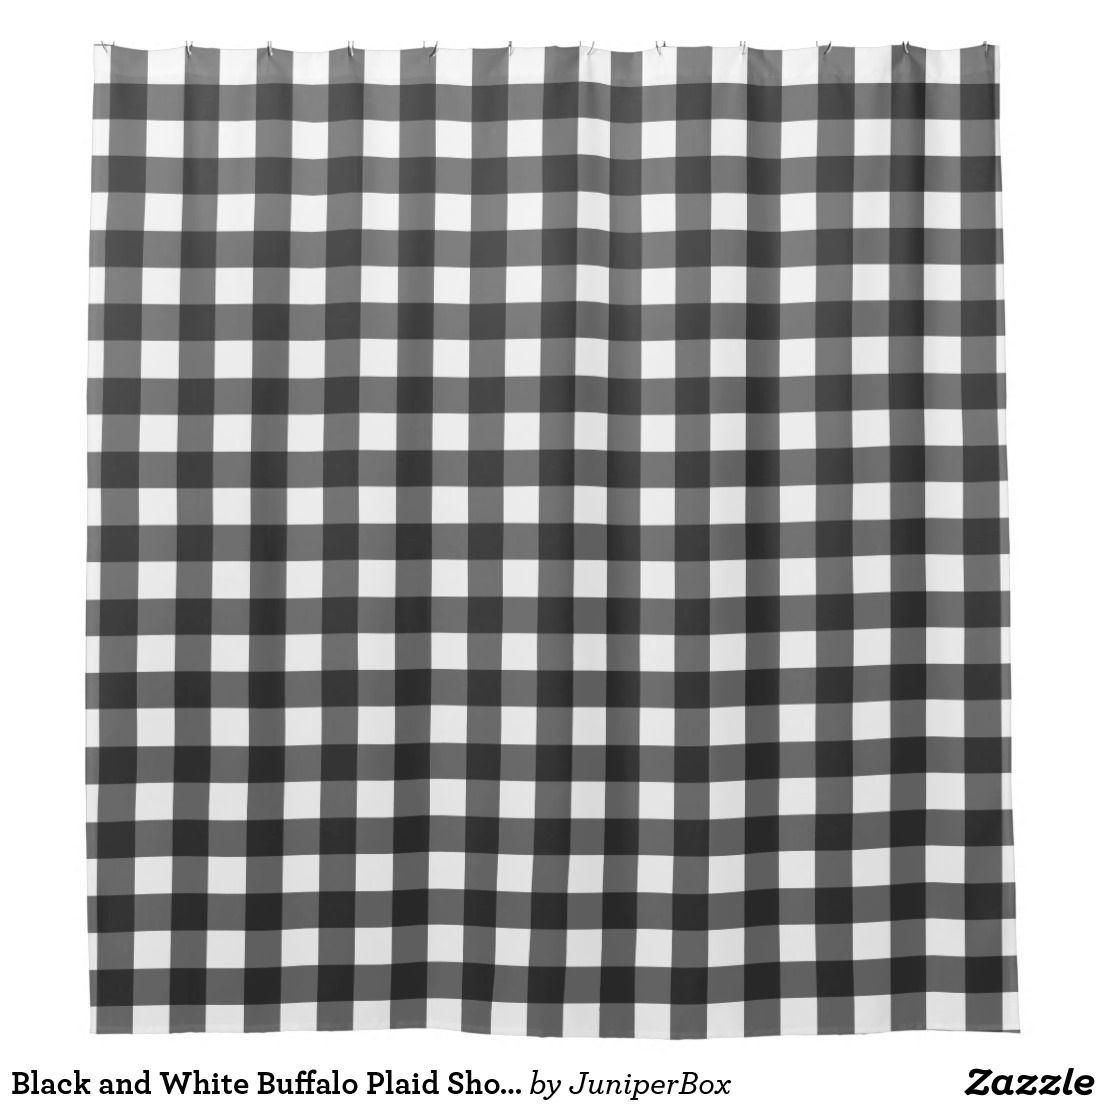 Black And White Buffalo Plaid Shower Curtain Zazzle Com Plaid Shower Curtain Rustic Shower Curtains Black Curtains